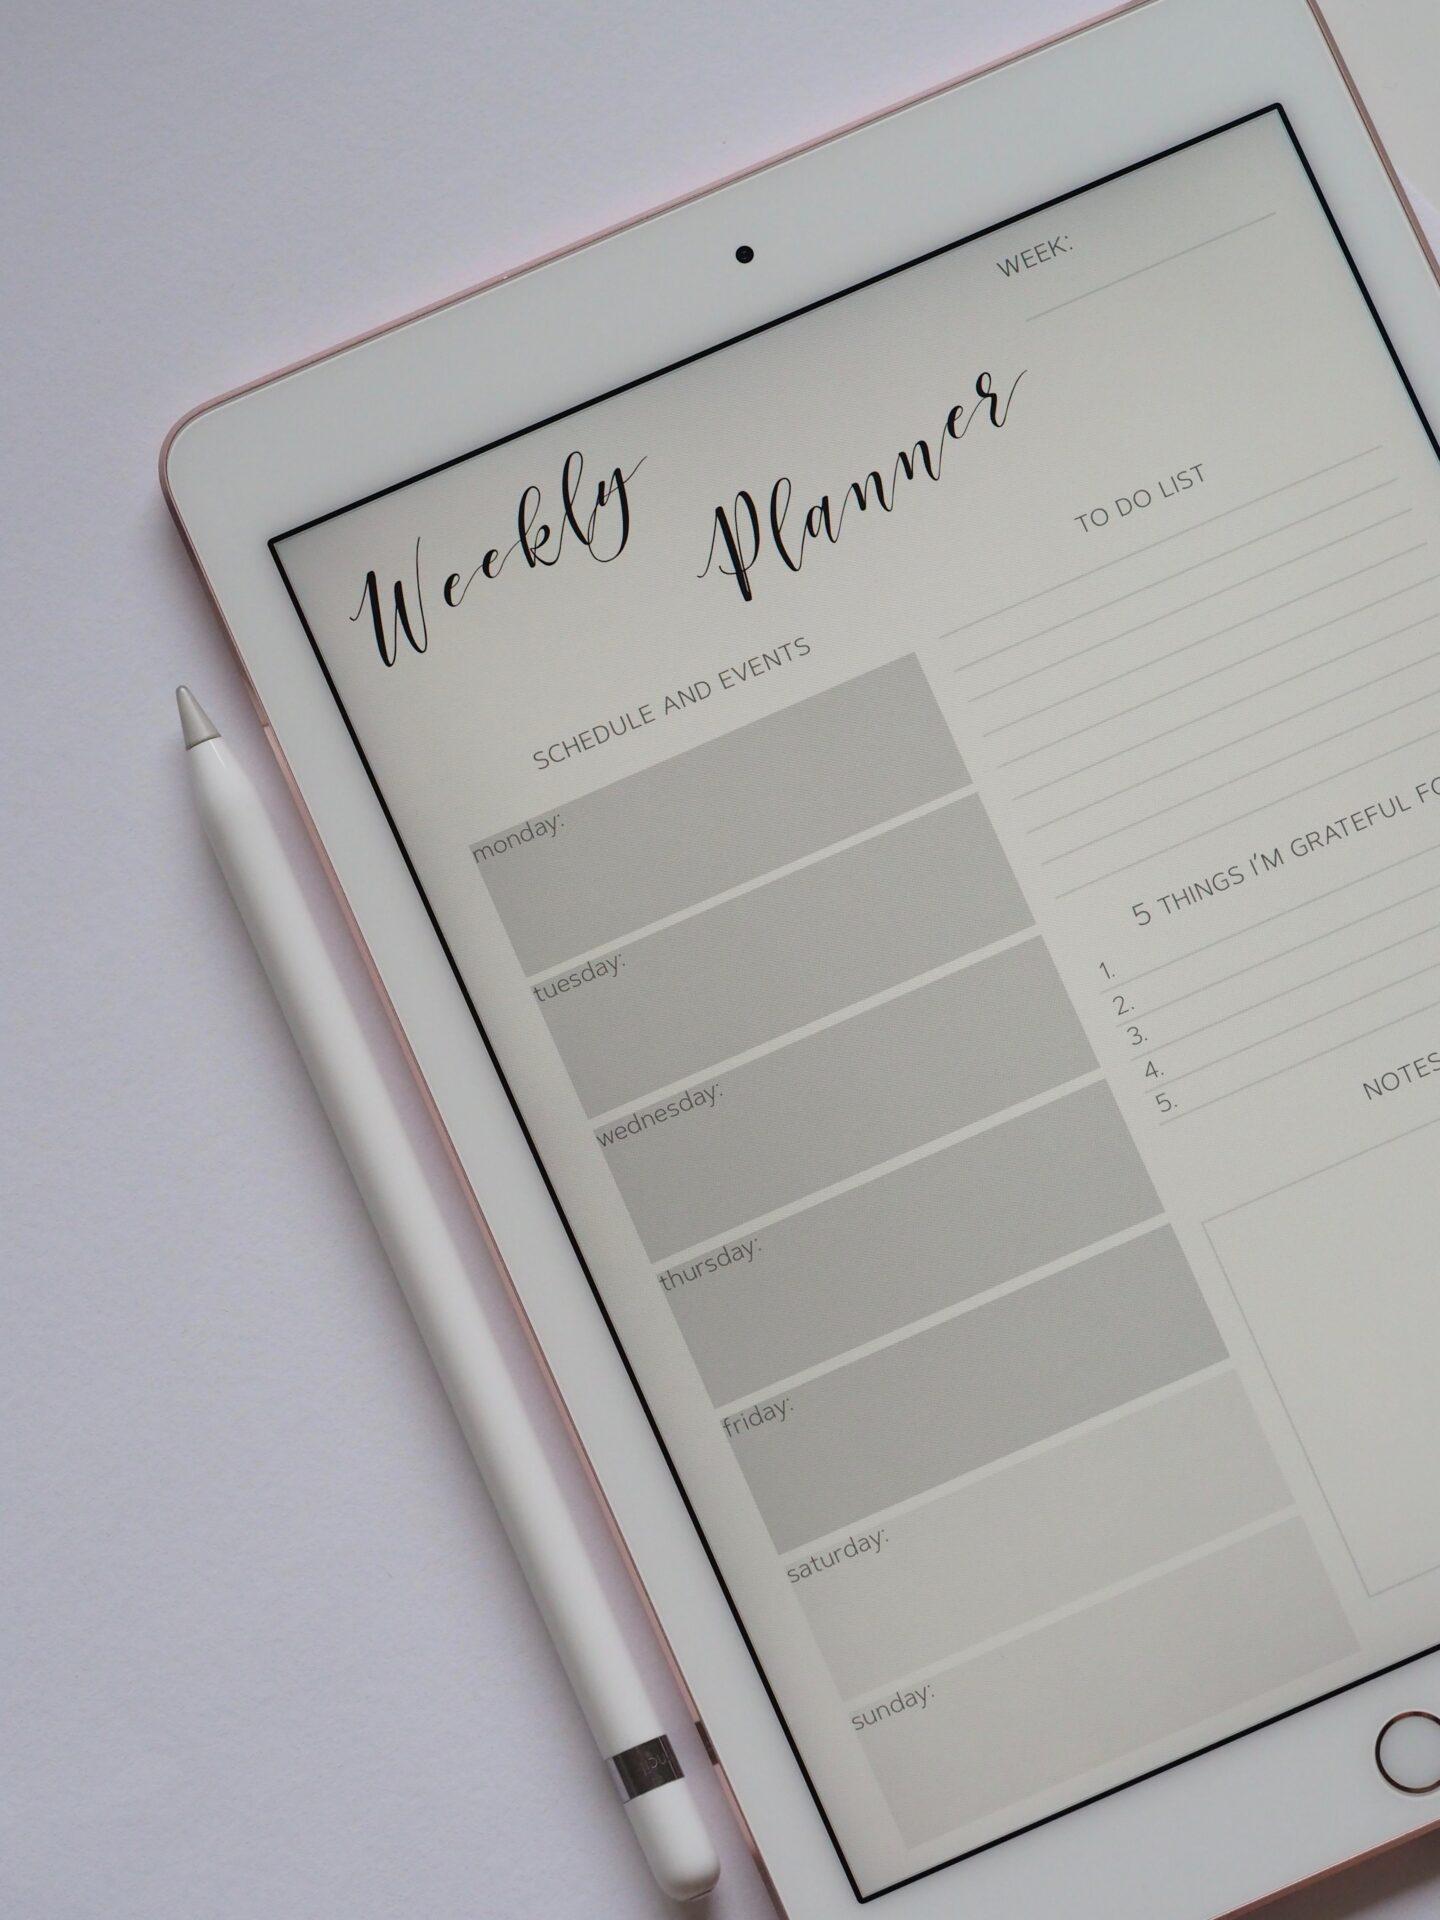 weekly planner on ipad